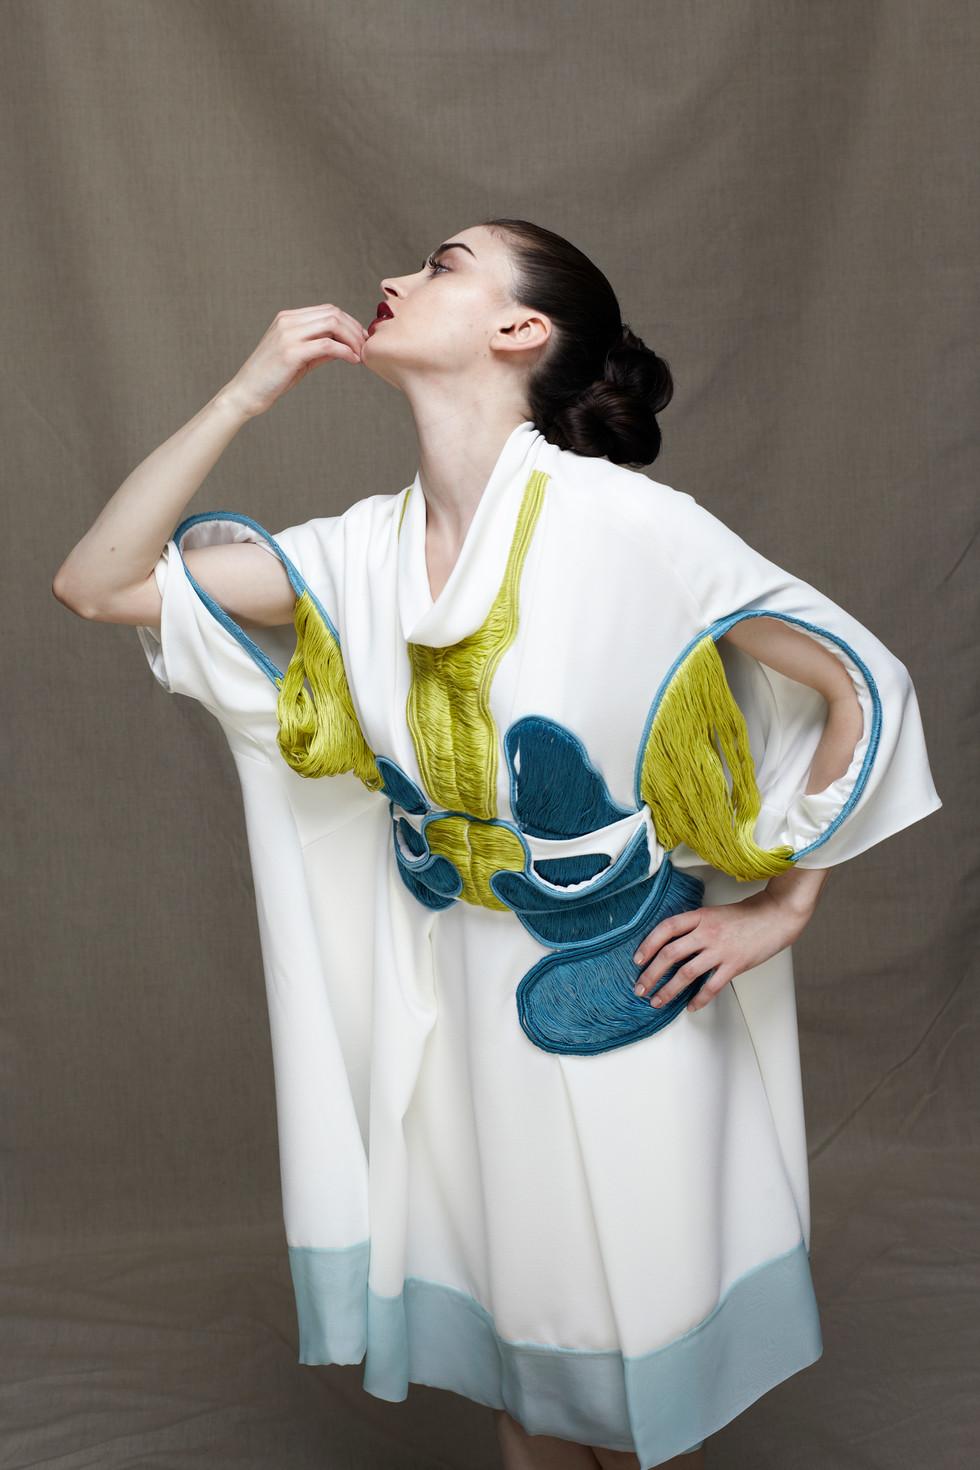 Art Of Dress Exhibition Tour Promo